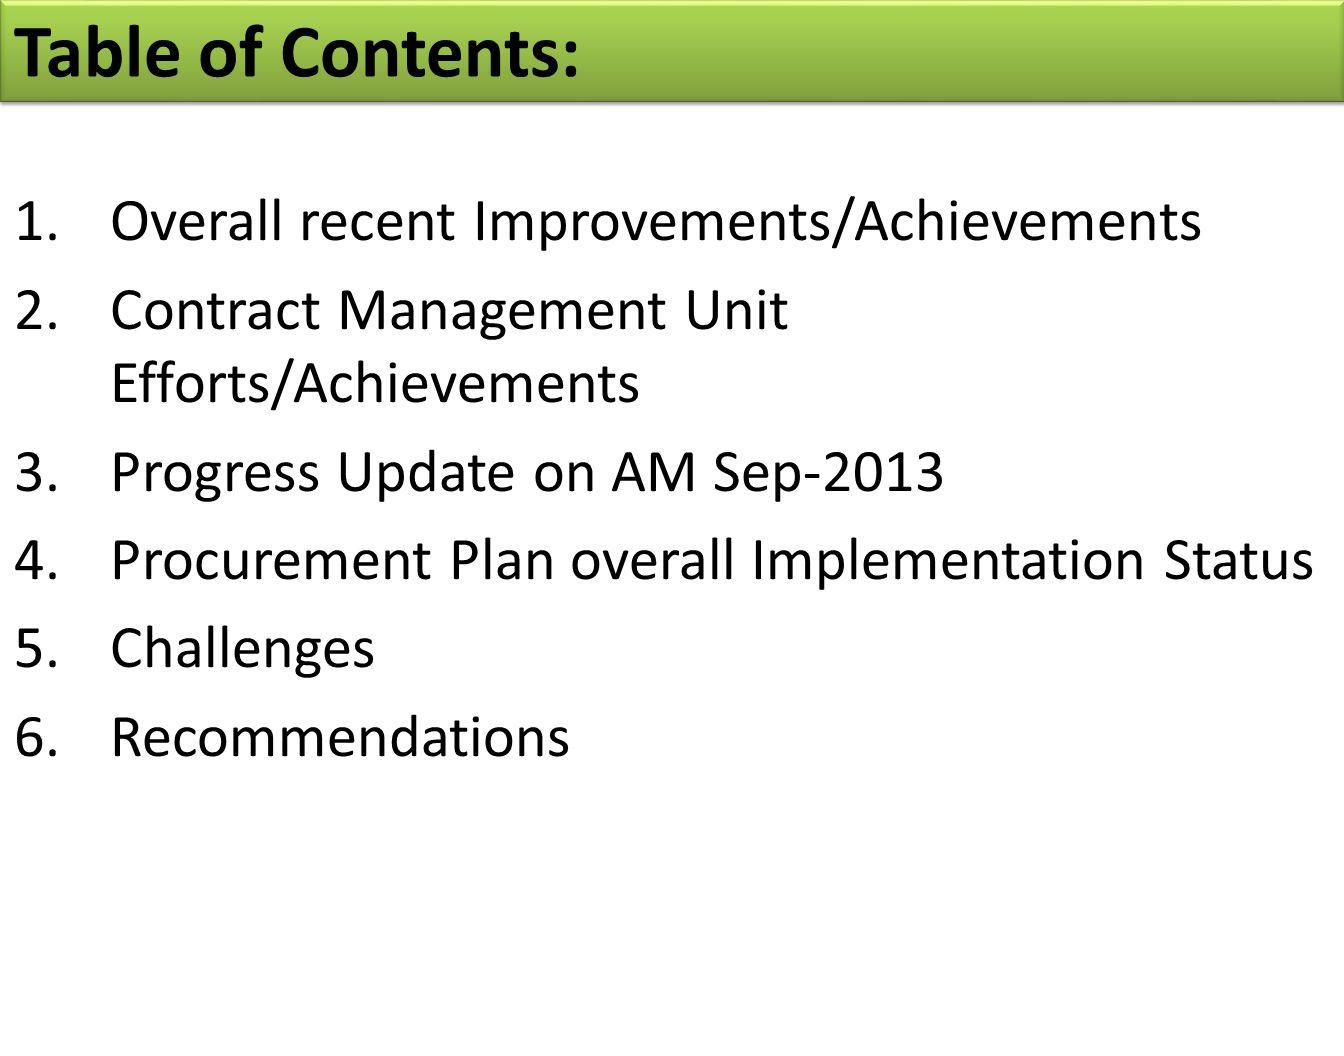 Table of Contents: 1.Overall recent Improvements/Achievements 2.Contract Management Unit Efforts/Achievements 3.Progress Update on AM Sep-2013 4.Procurement Plan overall Implementation Status 5.Challenges 6.Recommendations